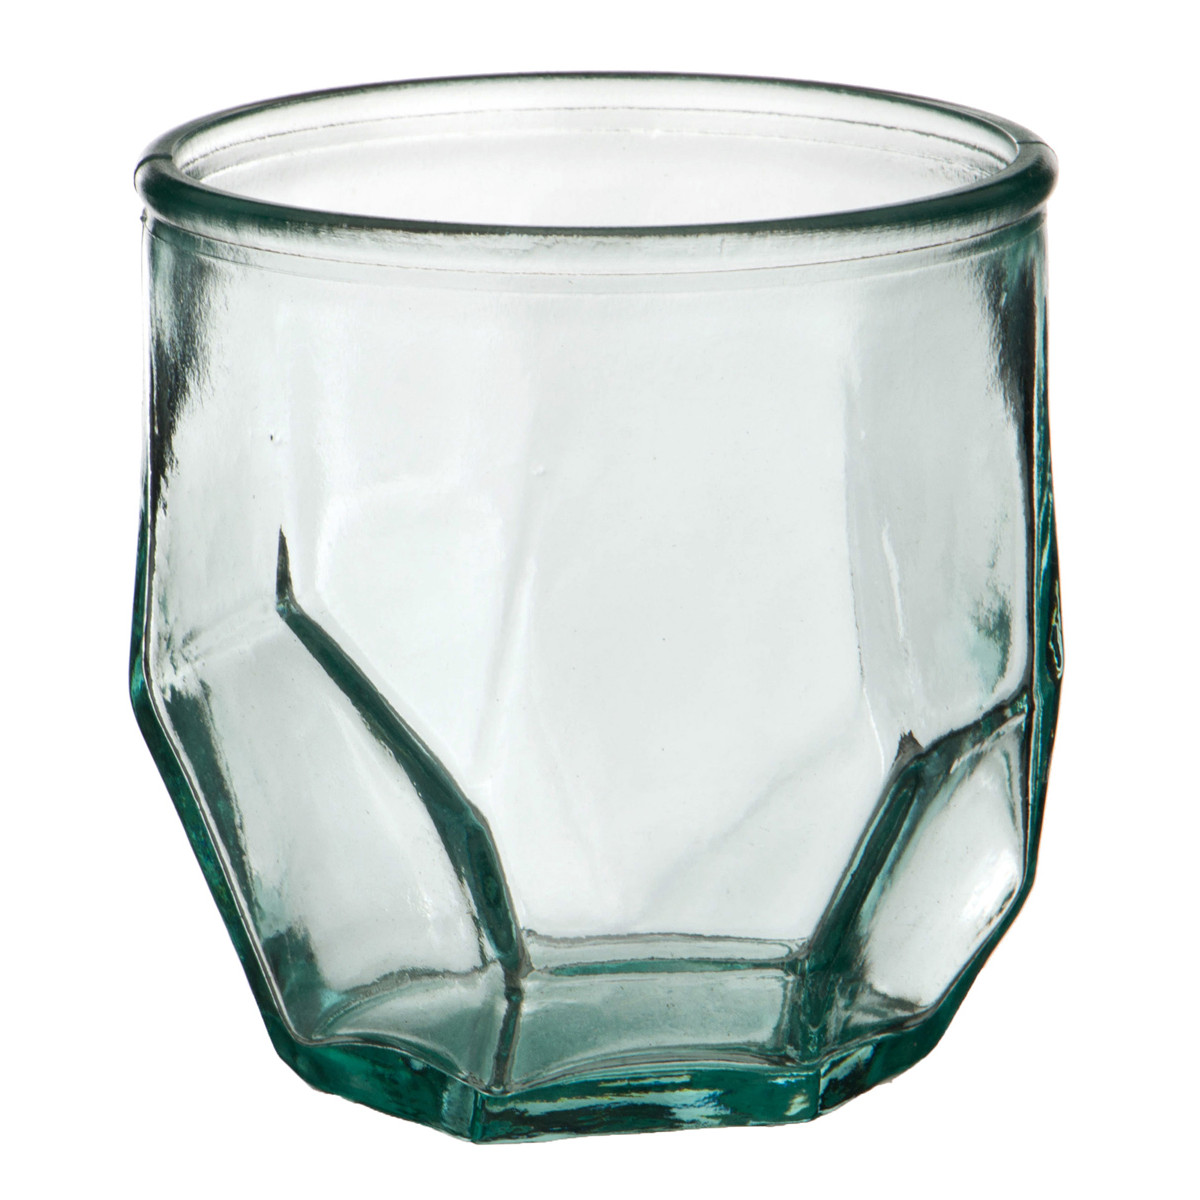 {} San Miguel Ваза Bala  (9 см) san miguel ваза bala 9 см